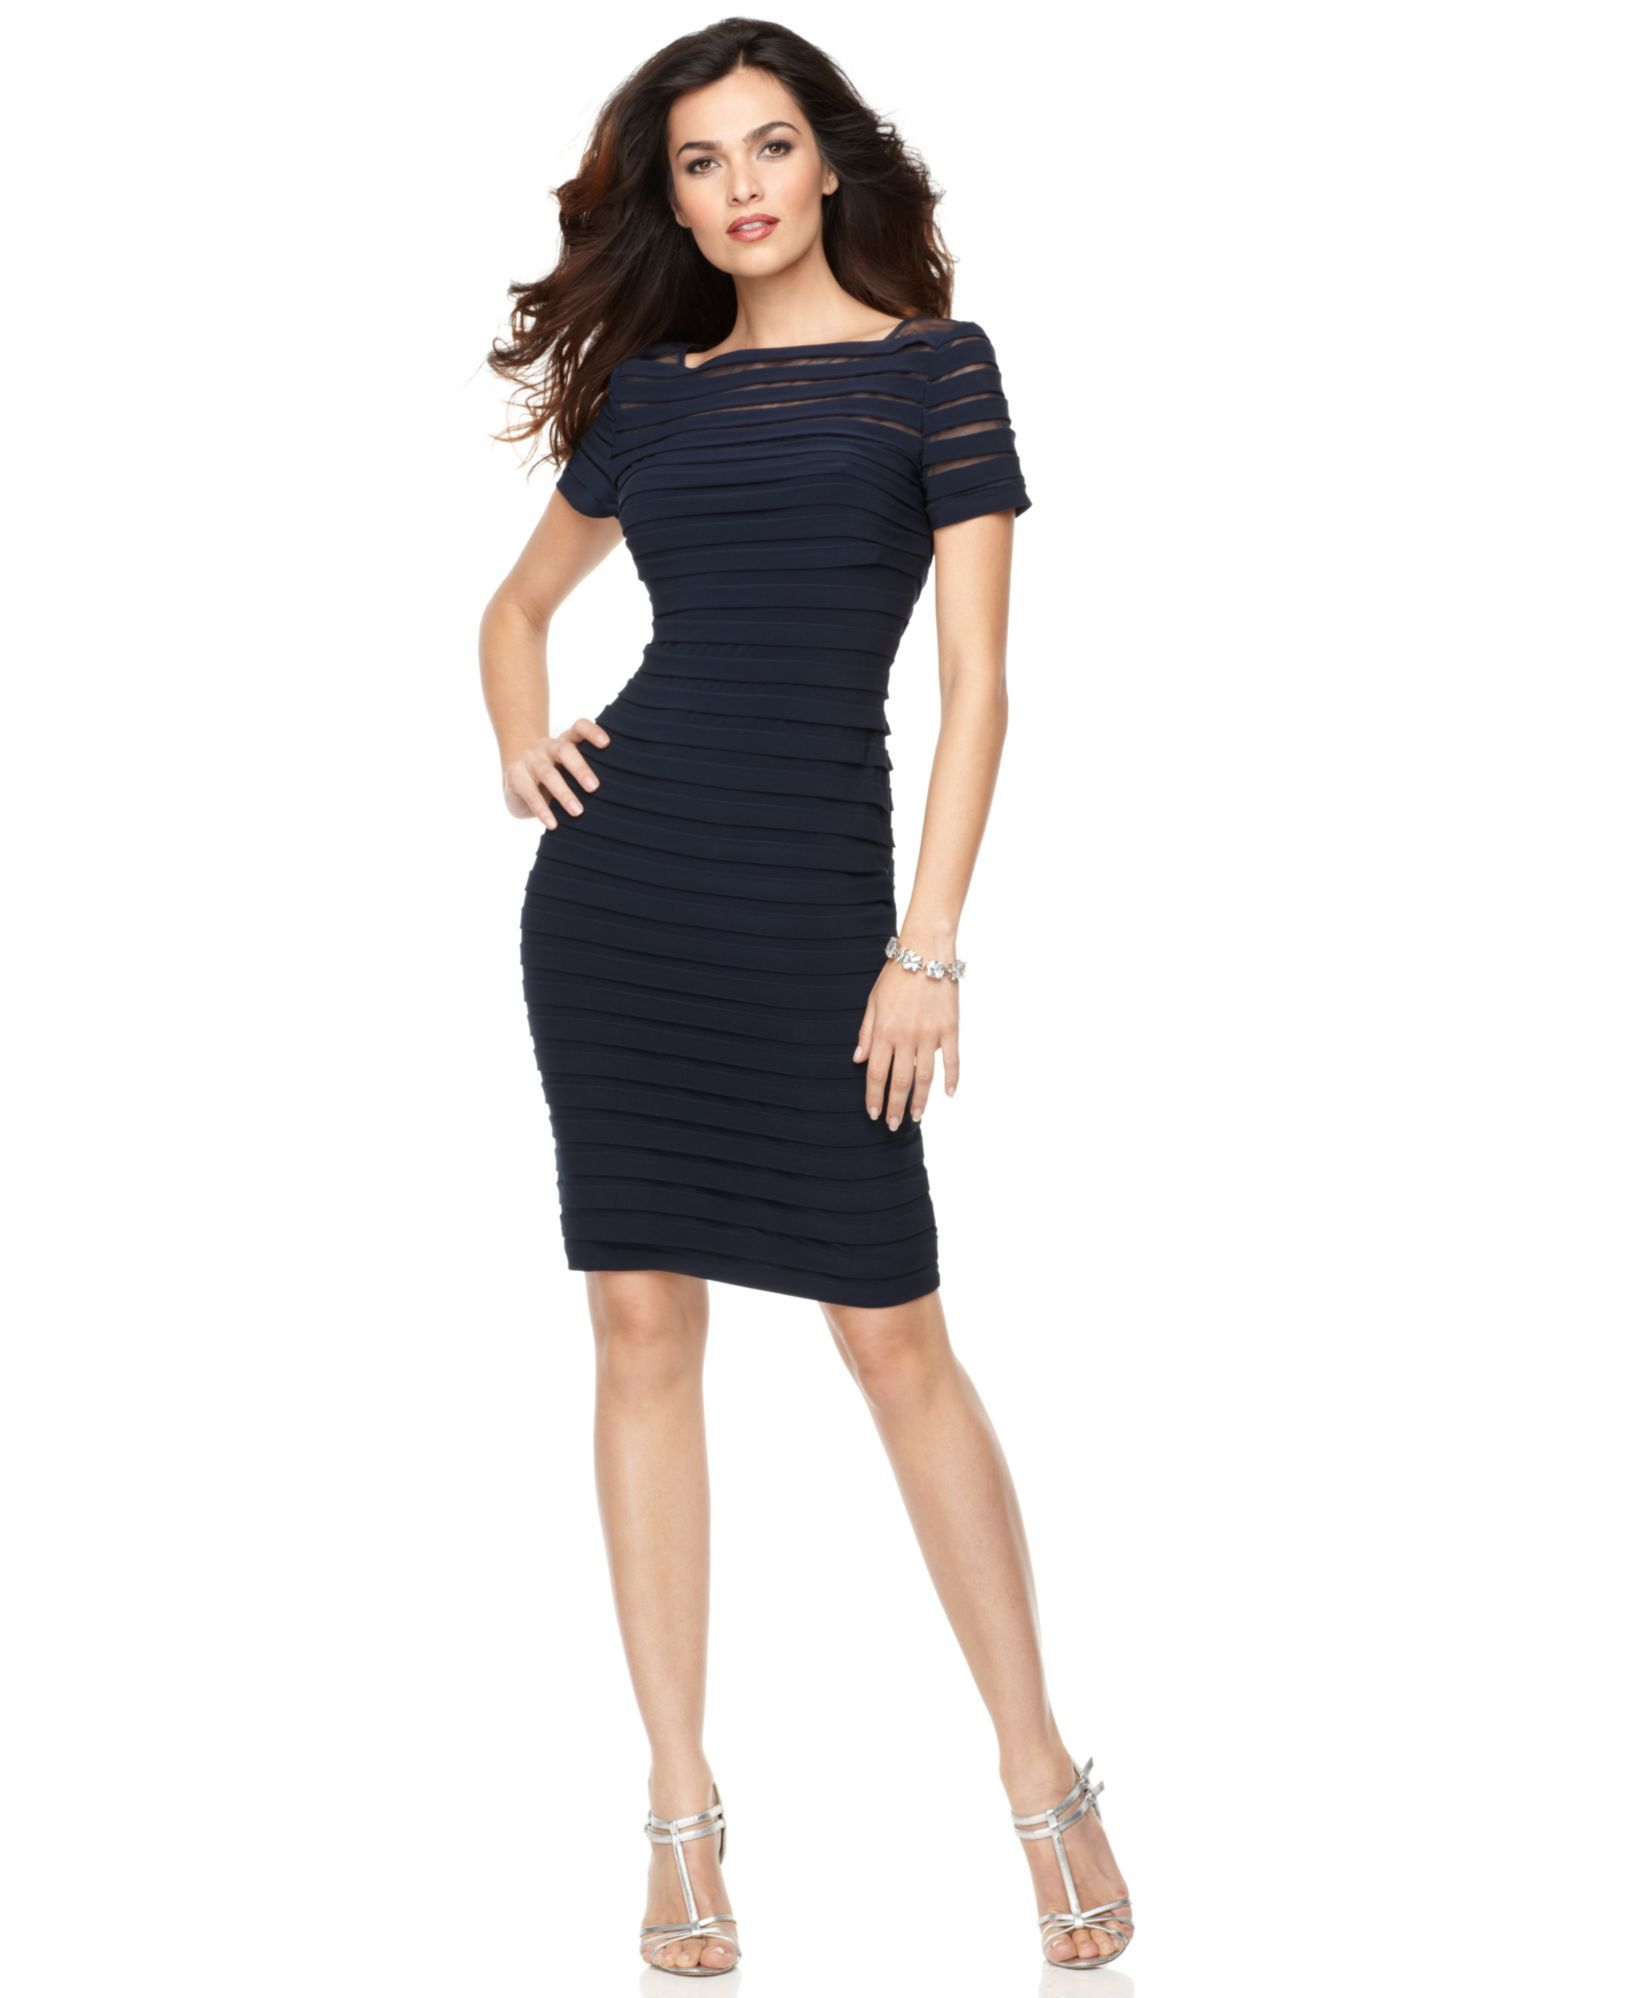 f78cb0bc6a9 Macys Petite Special Occasion Dresses